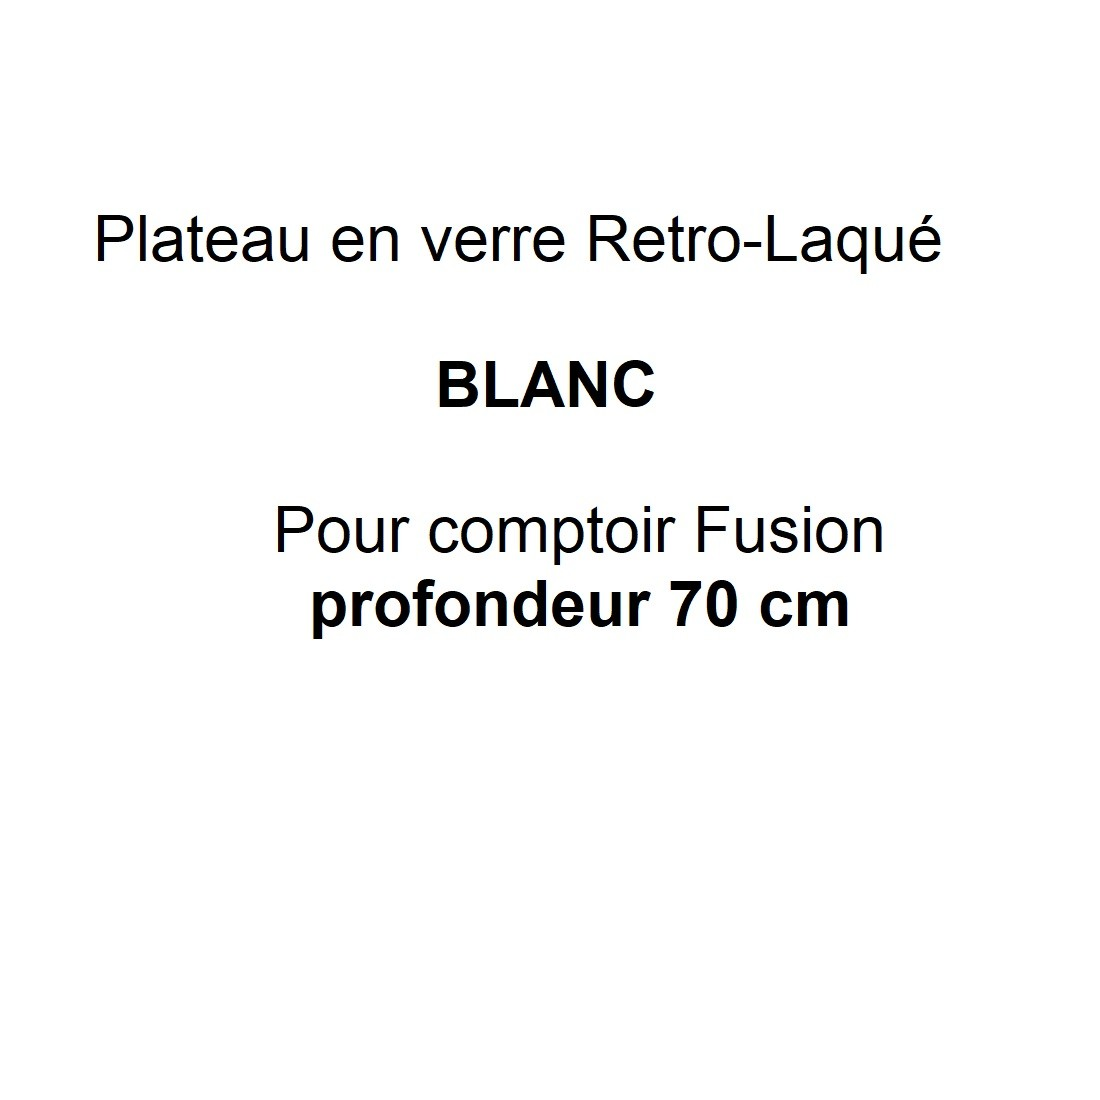 Verre rétro-laqué Blanc P.70 cm